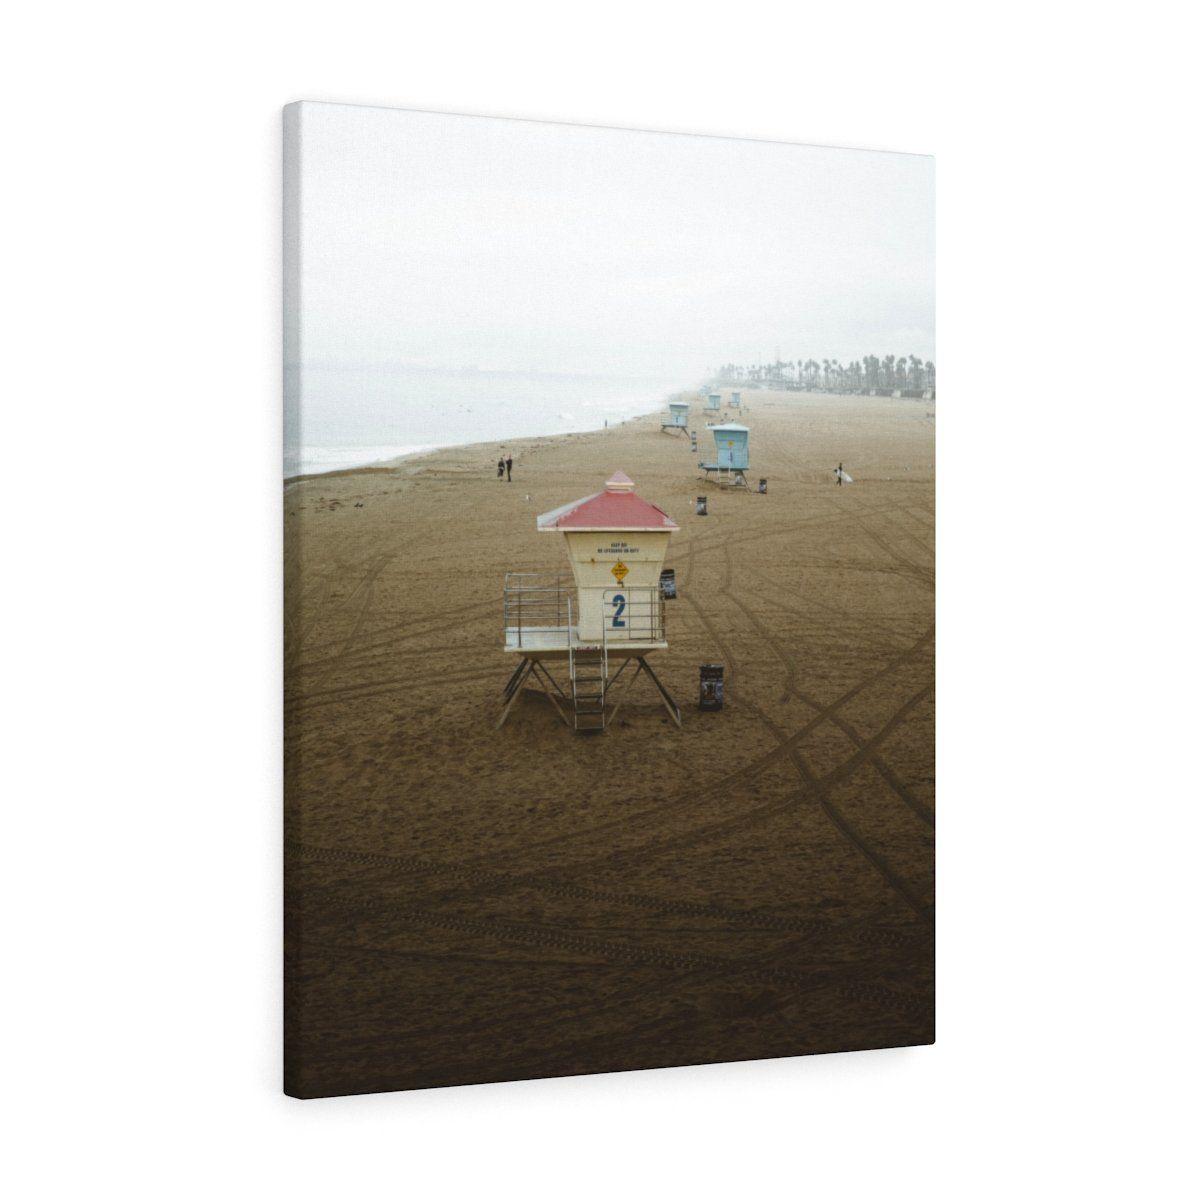 Huntington Beach Series 5